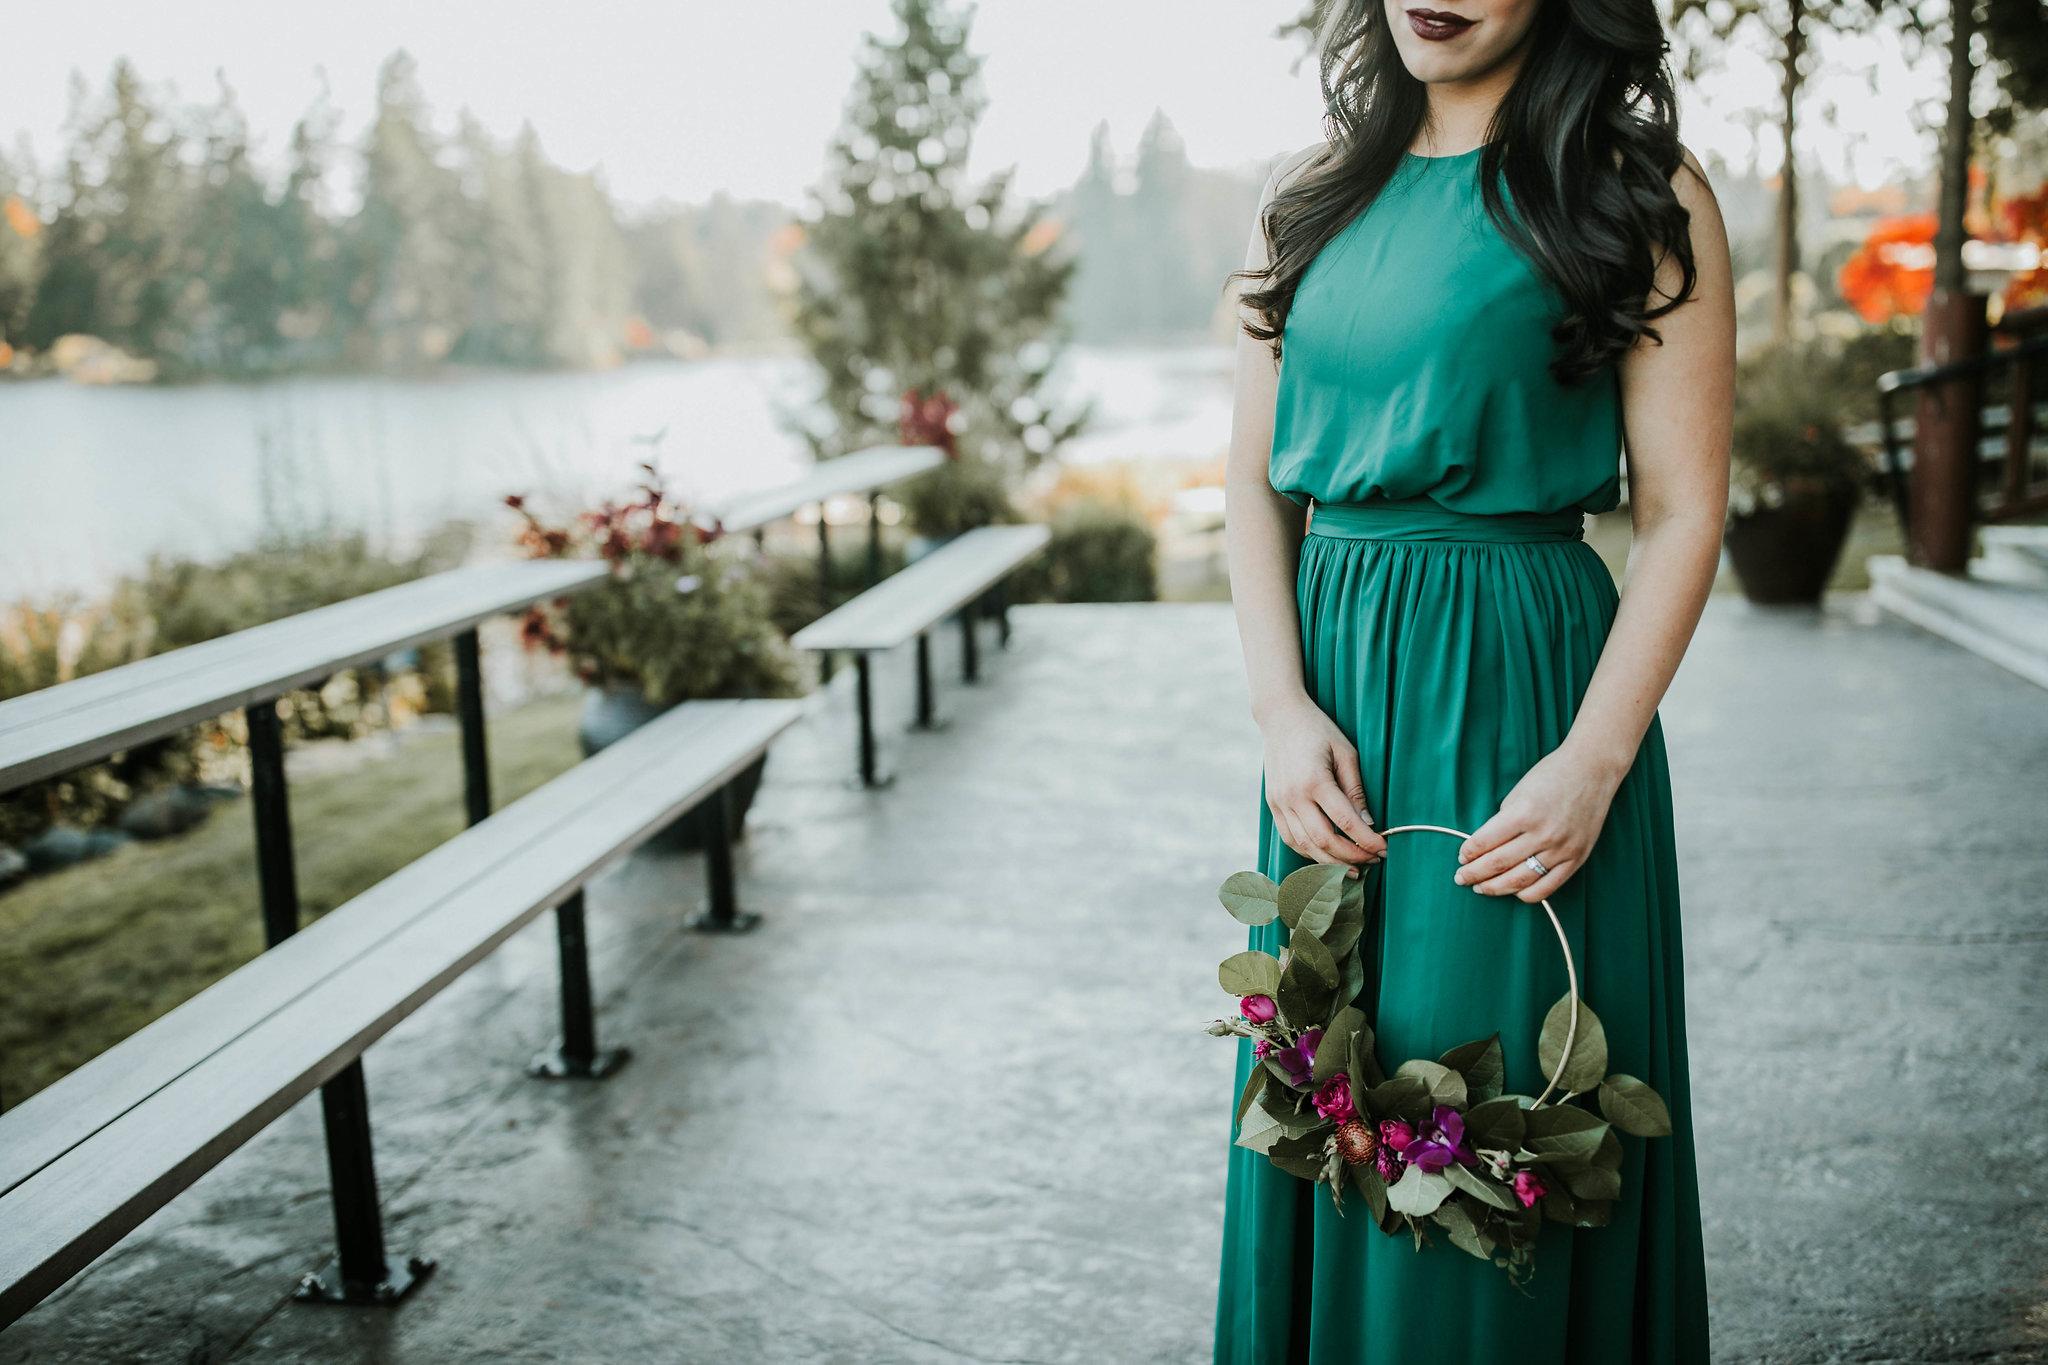 Crystal_Lake_lodge_Wedding_photos_by_Adina_Preston_Weddings_225.JPG